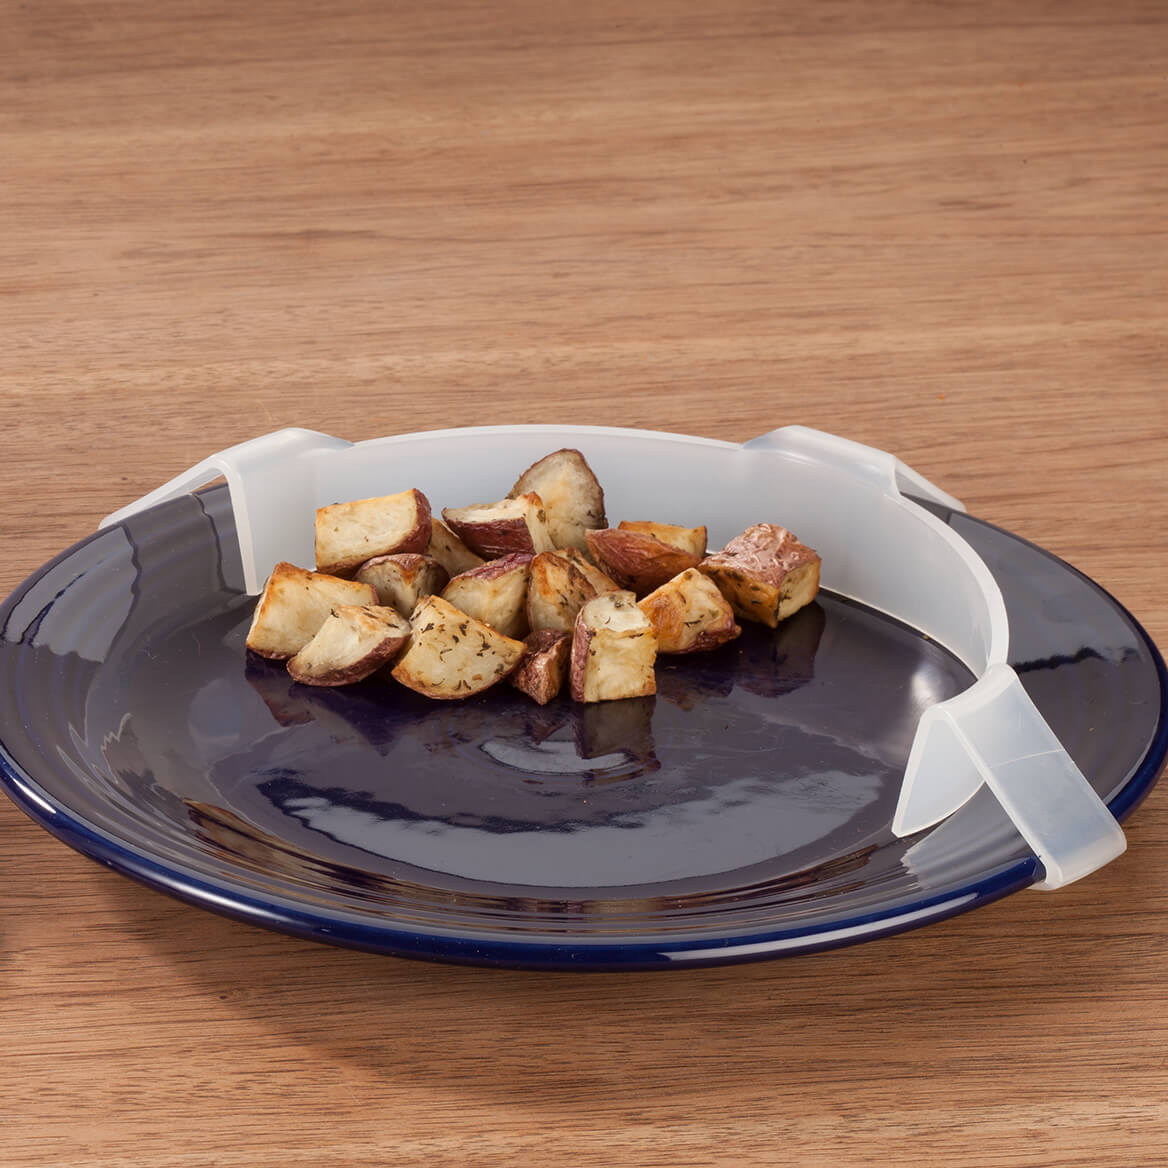 Ezy Bumper for Plate-367410